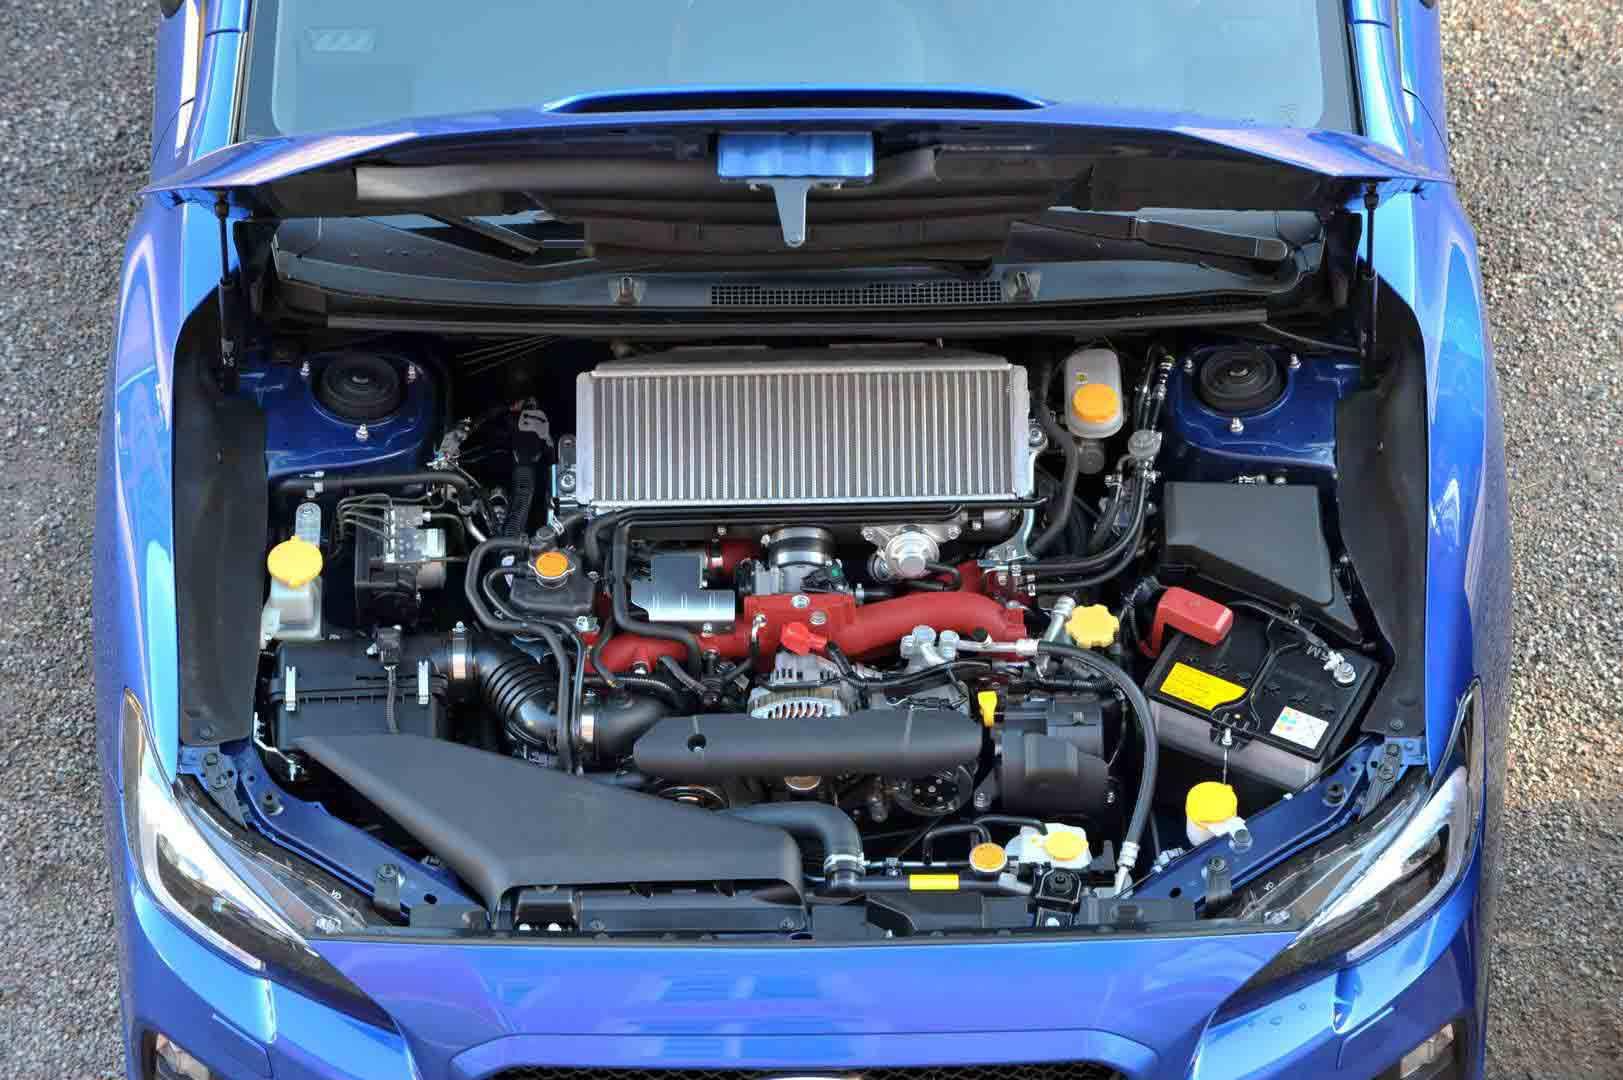 _Subaru-WRX-STI-Sport-motor